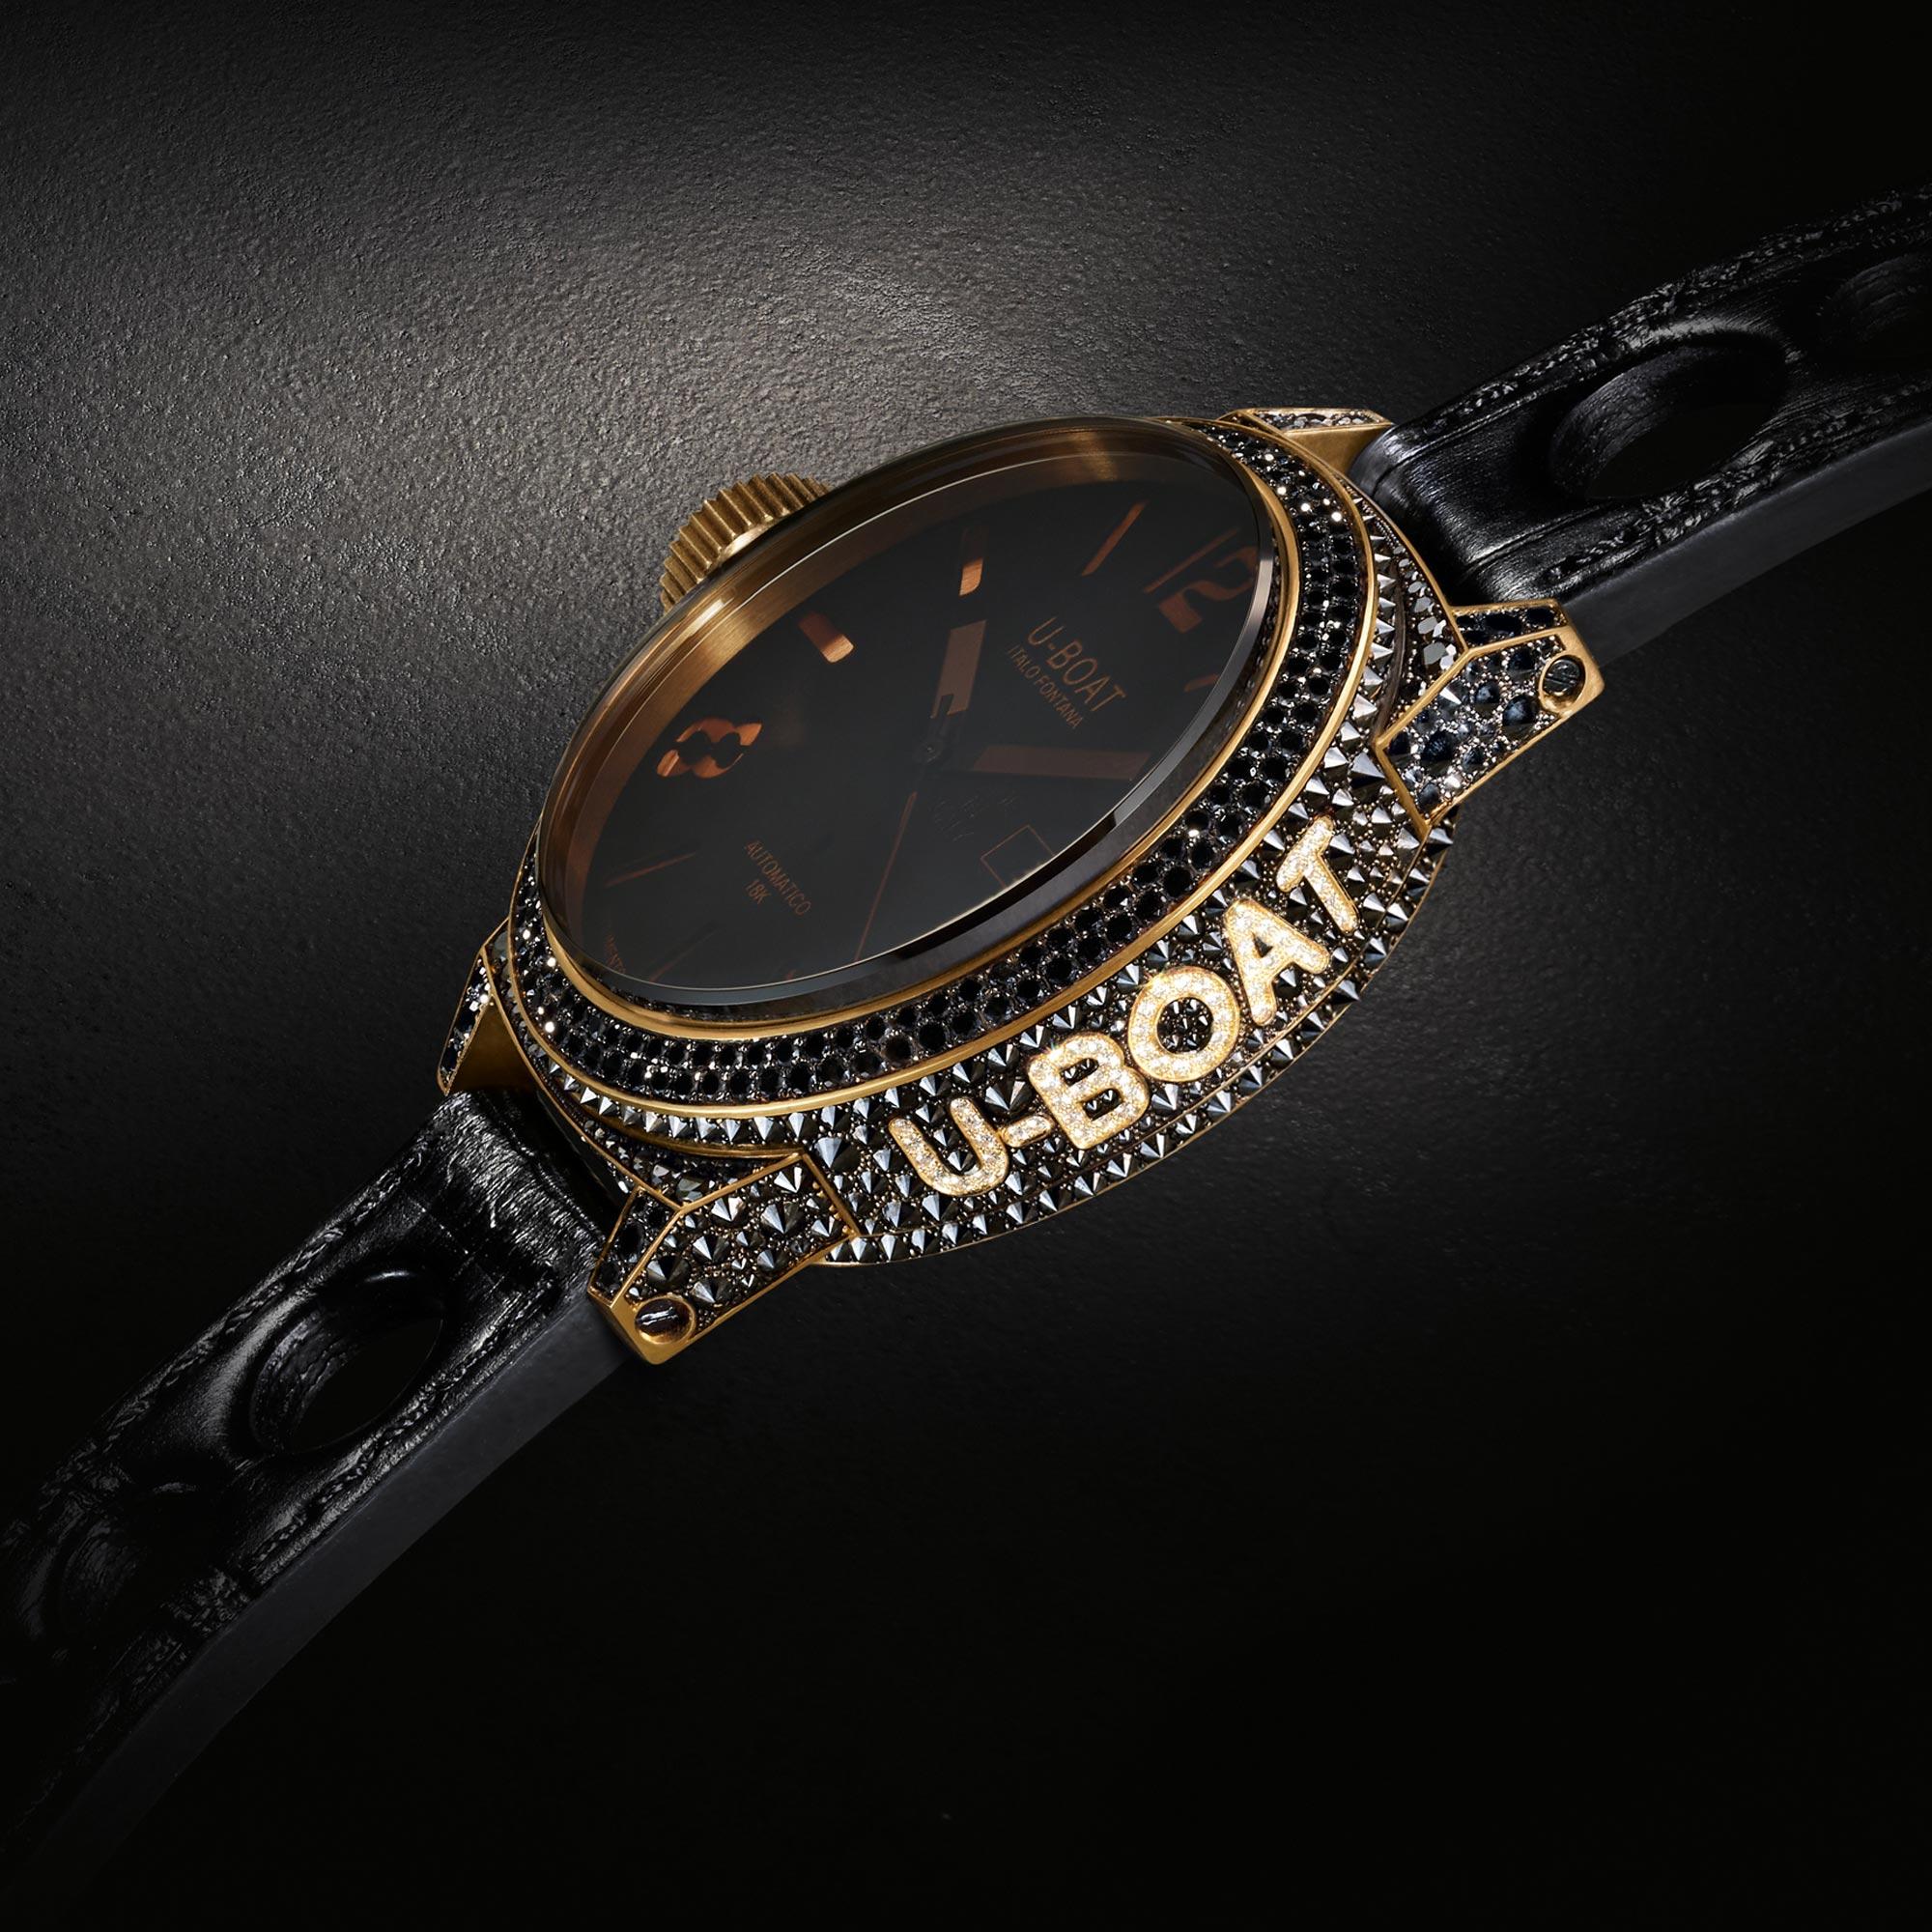 shining-diamonds-u-boat-precious-black-swan-8000-replica-watches